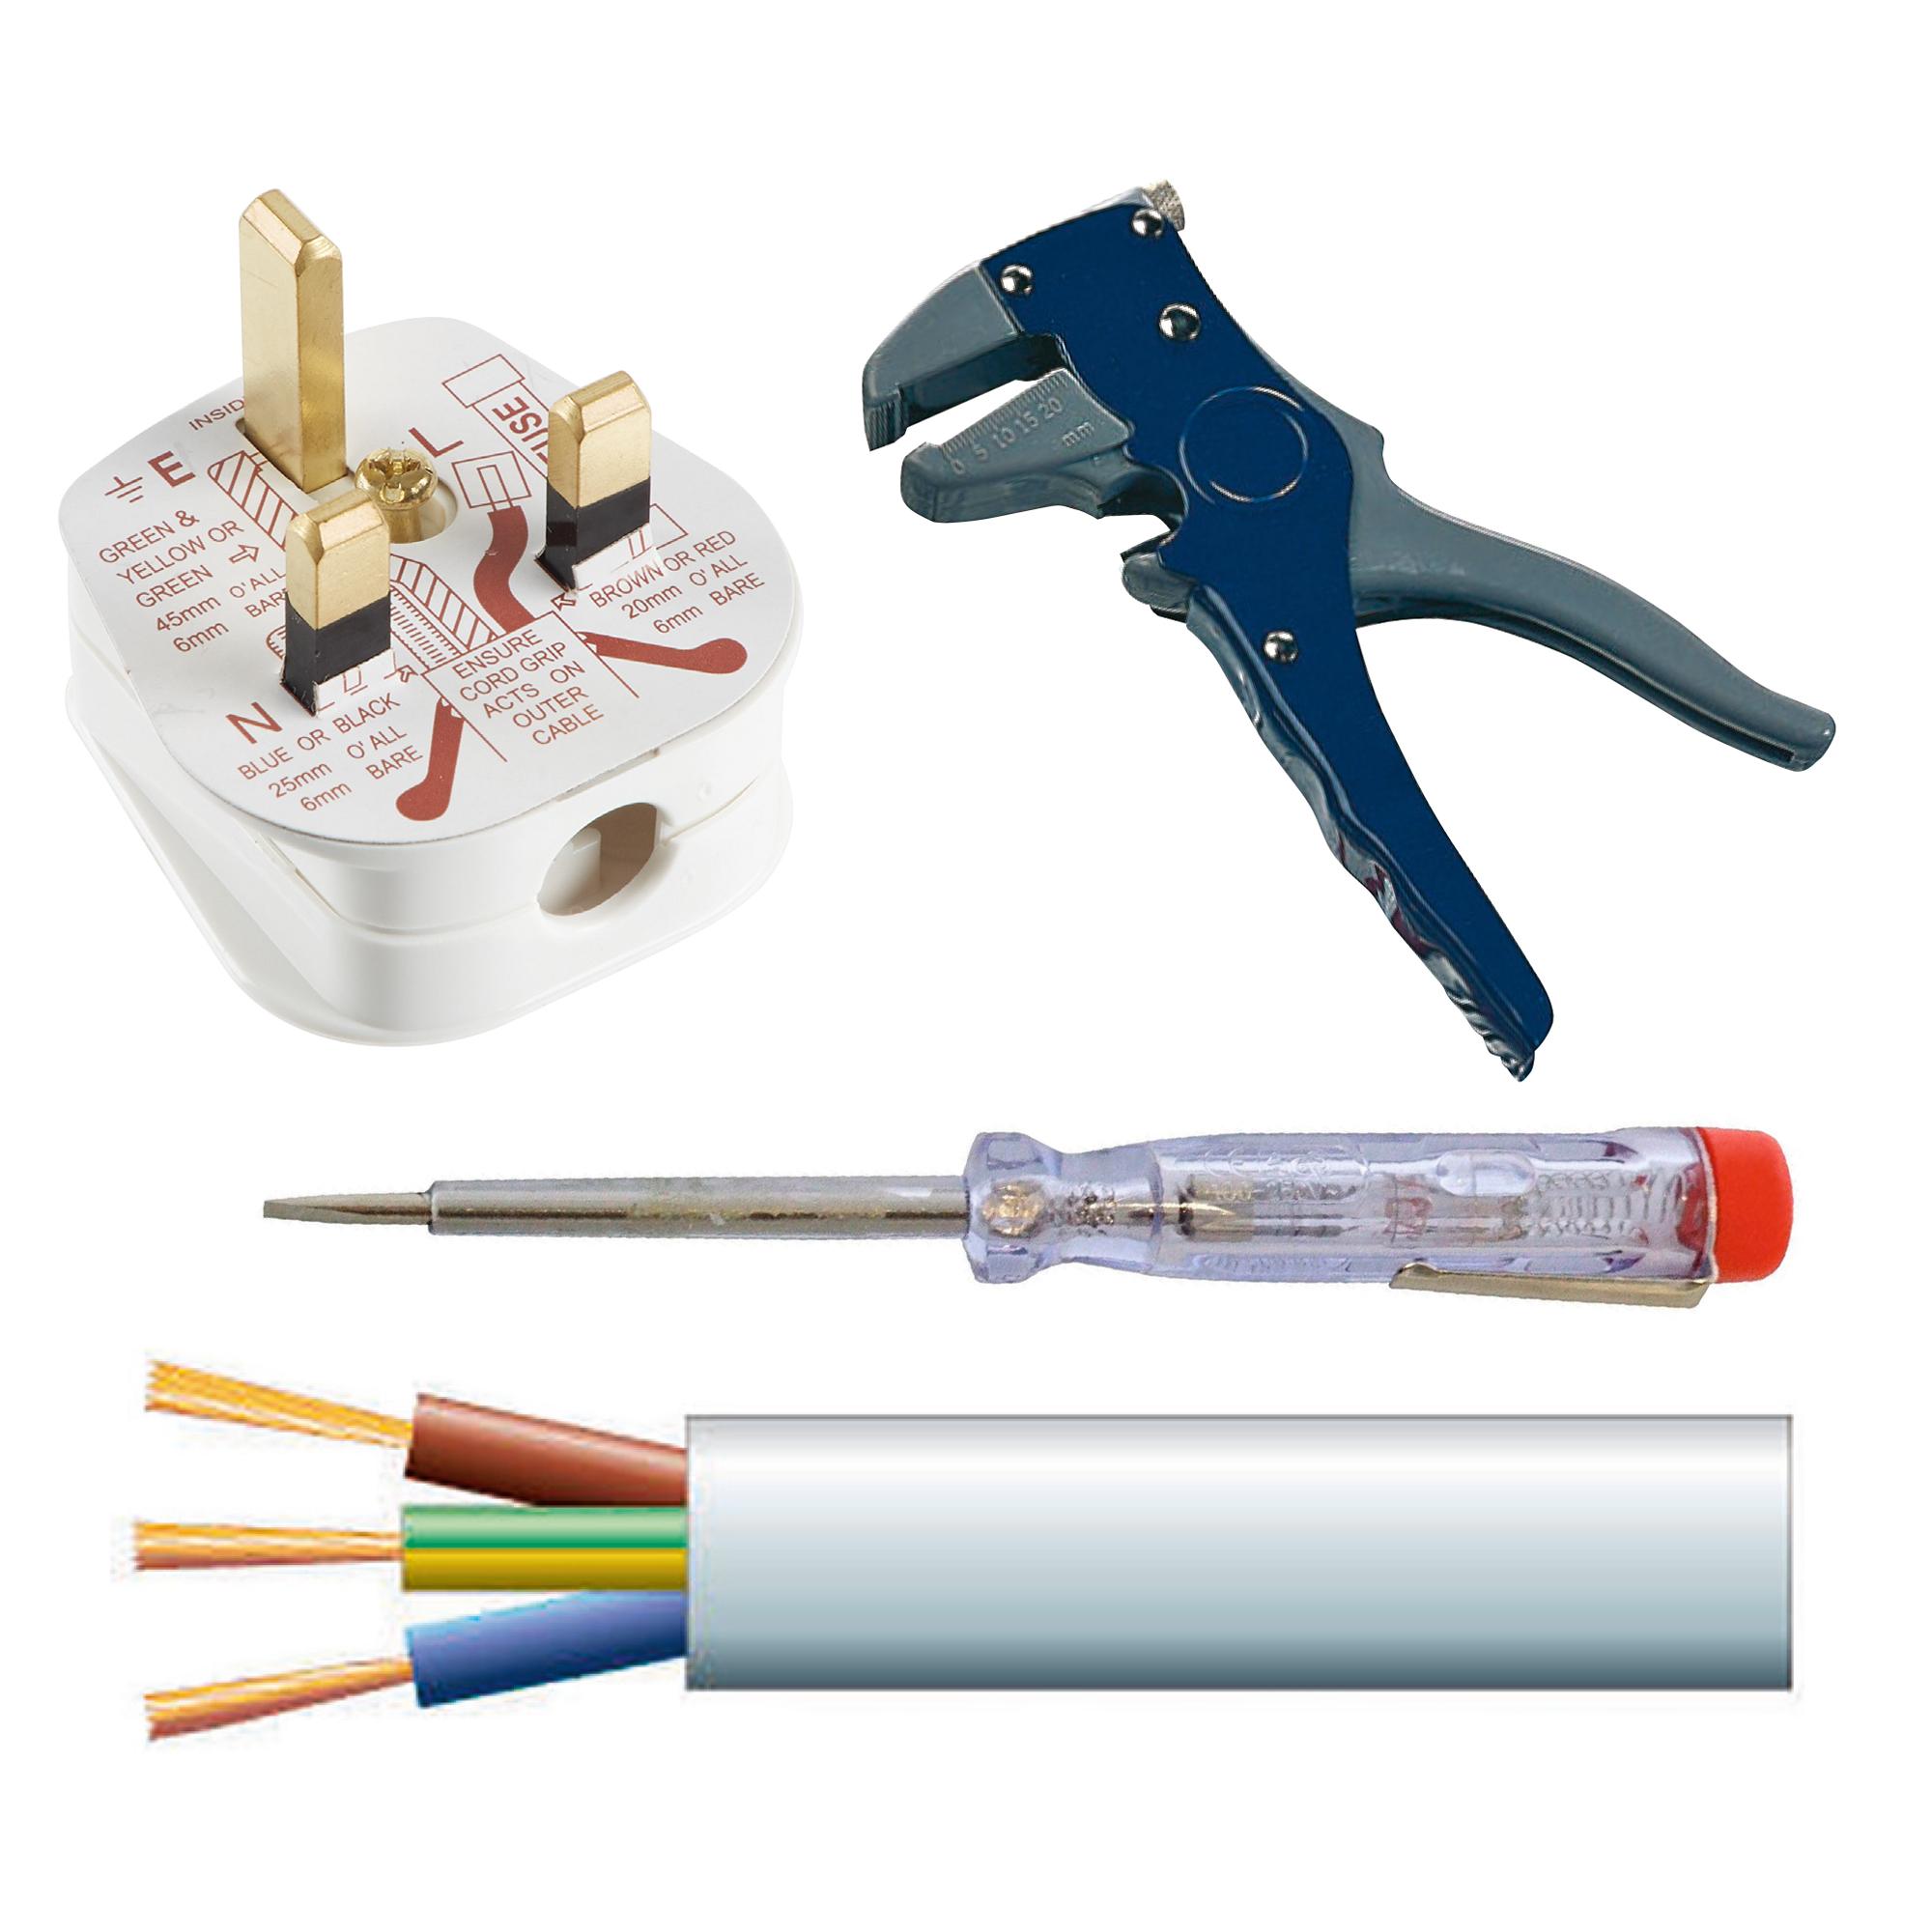 Expand Plug Wiring Auto Electrical Diagram 110v Uk Kit Philip Harris Rh Philipharris Co 2 Prong Us 3